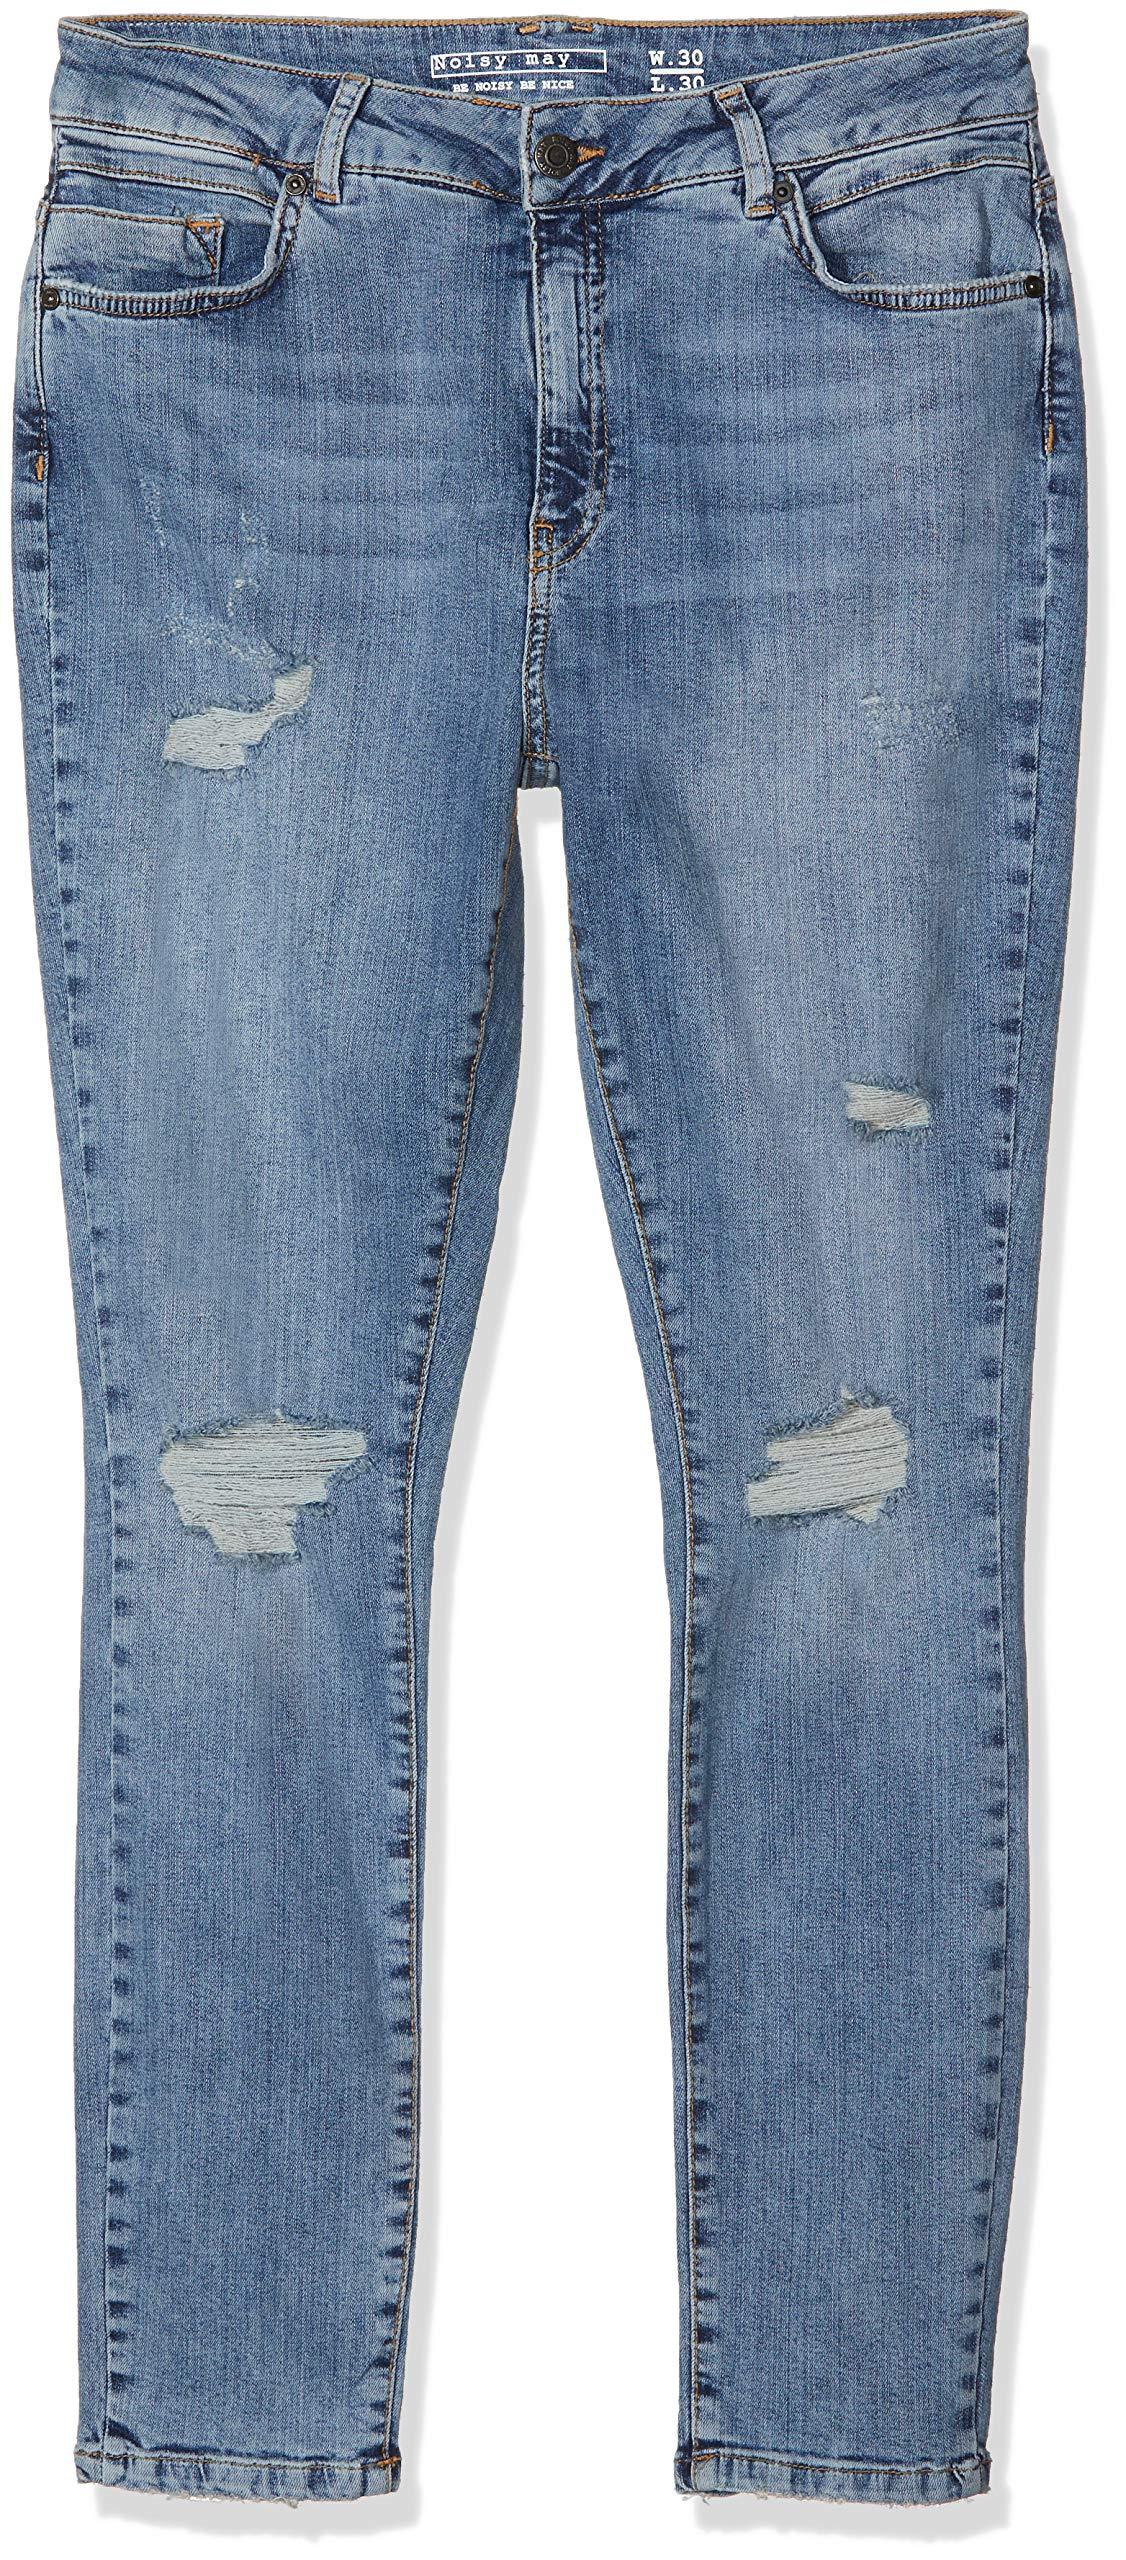 Noisy DenimW30 l30taille Lw Fabricant30Femme Medium Jeans Destroy May Nmnelly SlimBleu Blue Ba404 Noos BdCxWQoeEr